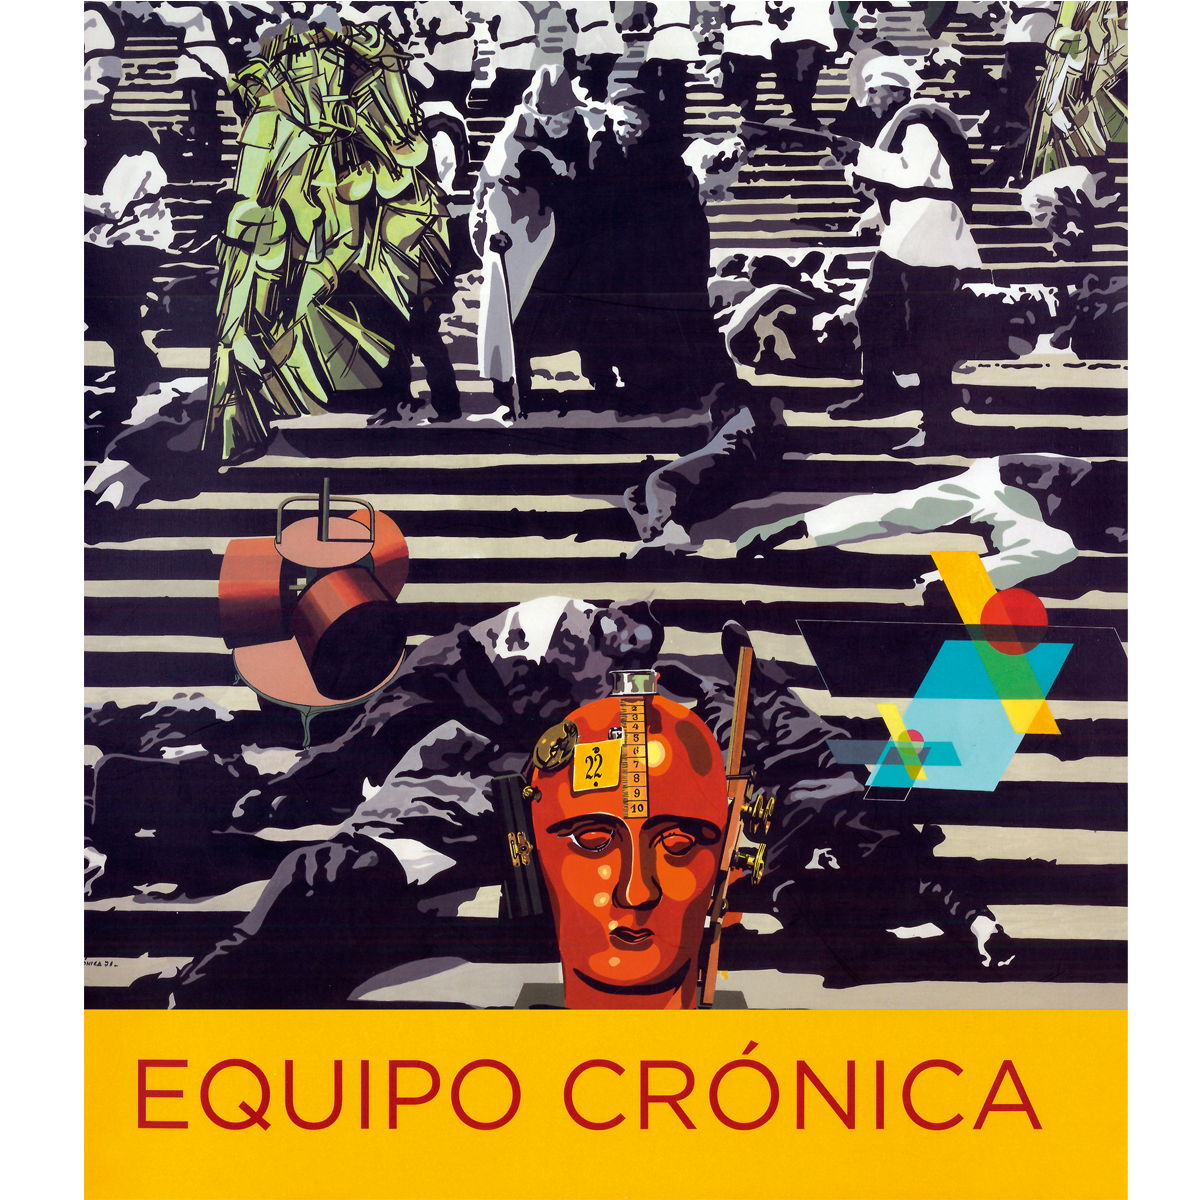 Equipo Crónica